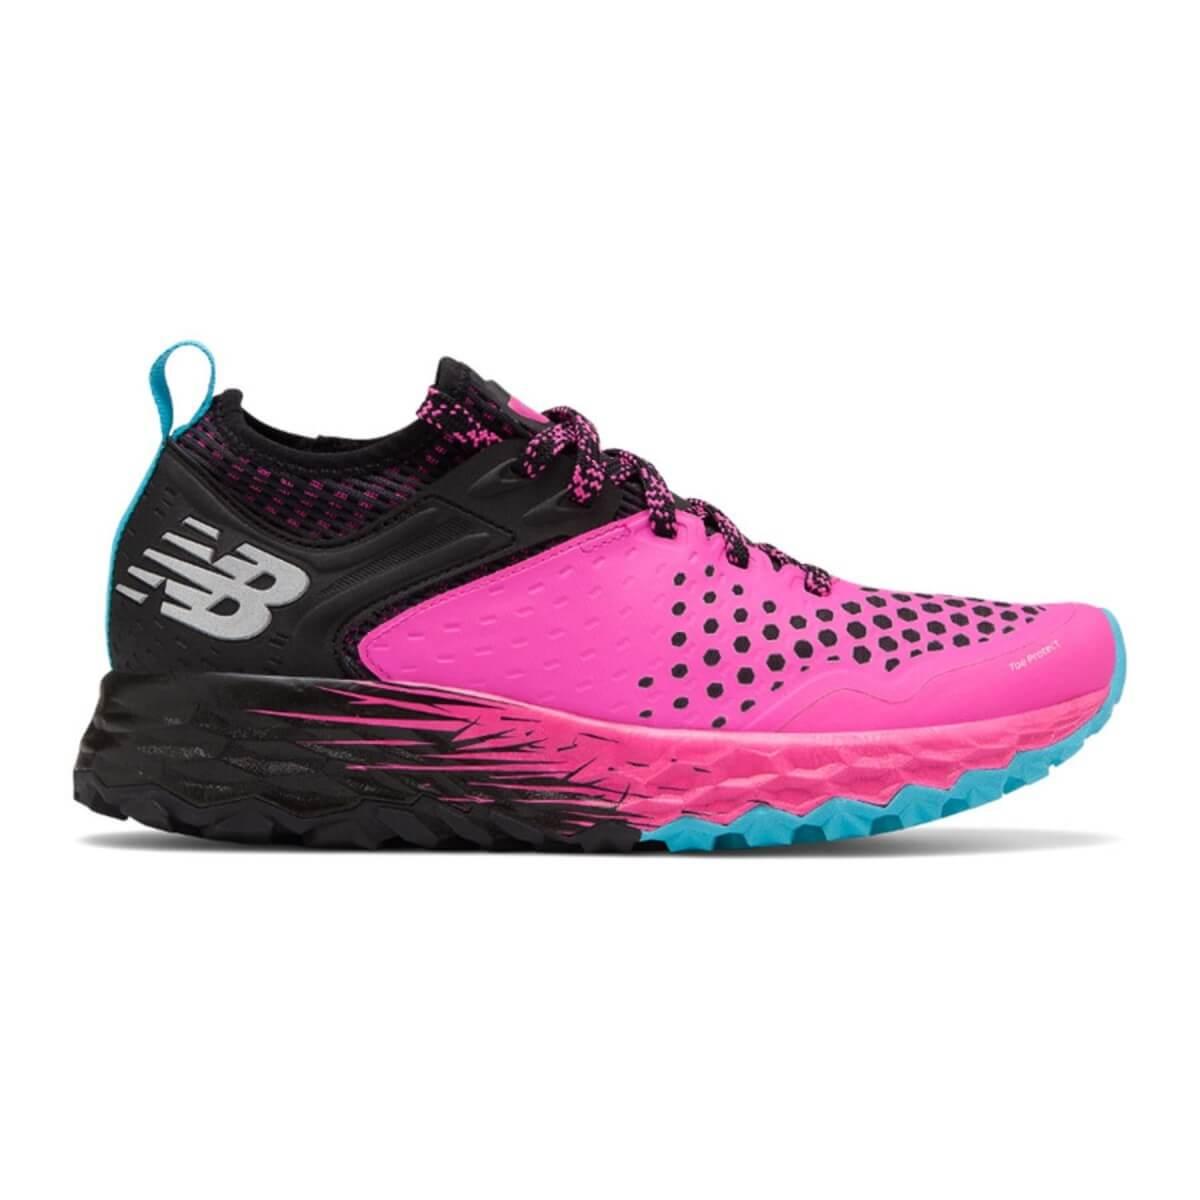 estoy de acuerdo con agudo pasta  New Balance Fresh Foam Hierro v4 Women's Running Shoes Pink Black